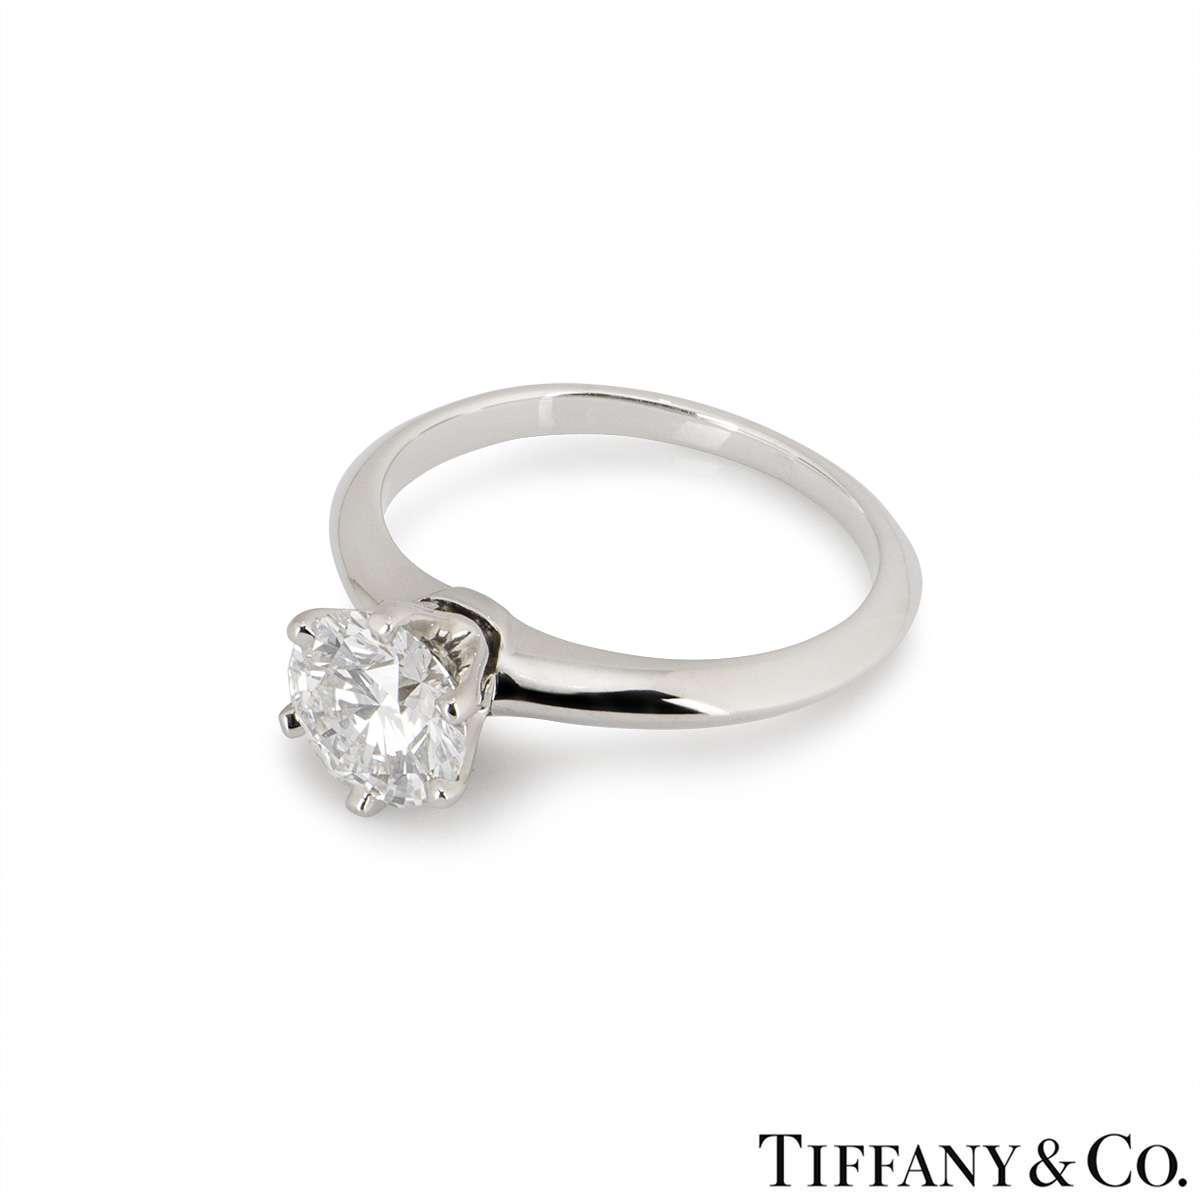 Tiffany & Co. Platinum Diamond Setting Ring 1.01ct D/VS1